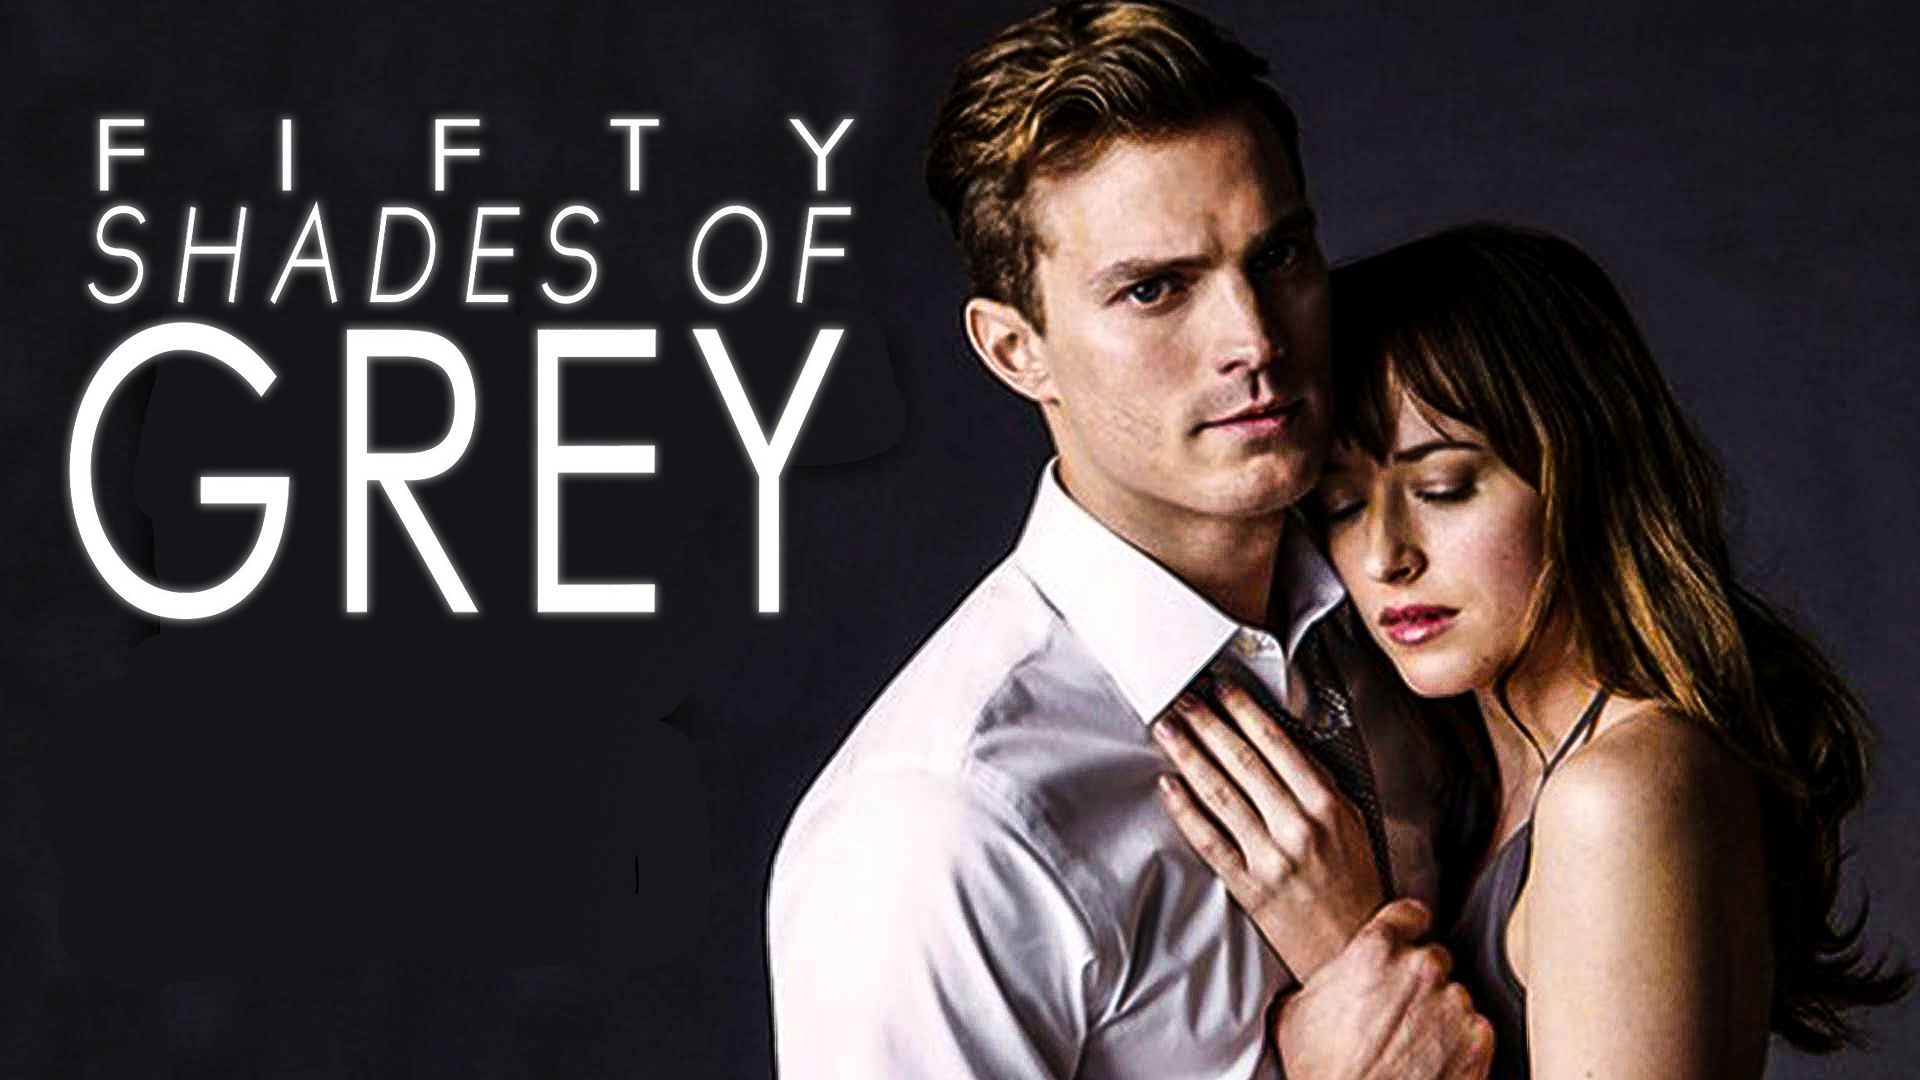 Download film fifty shades of grey sub indonesia ganool.